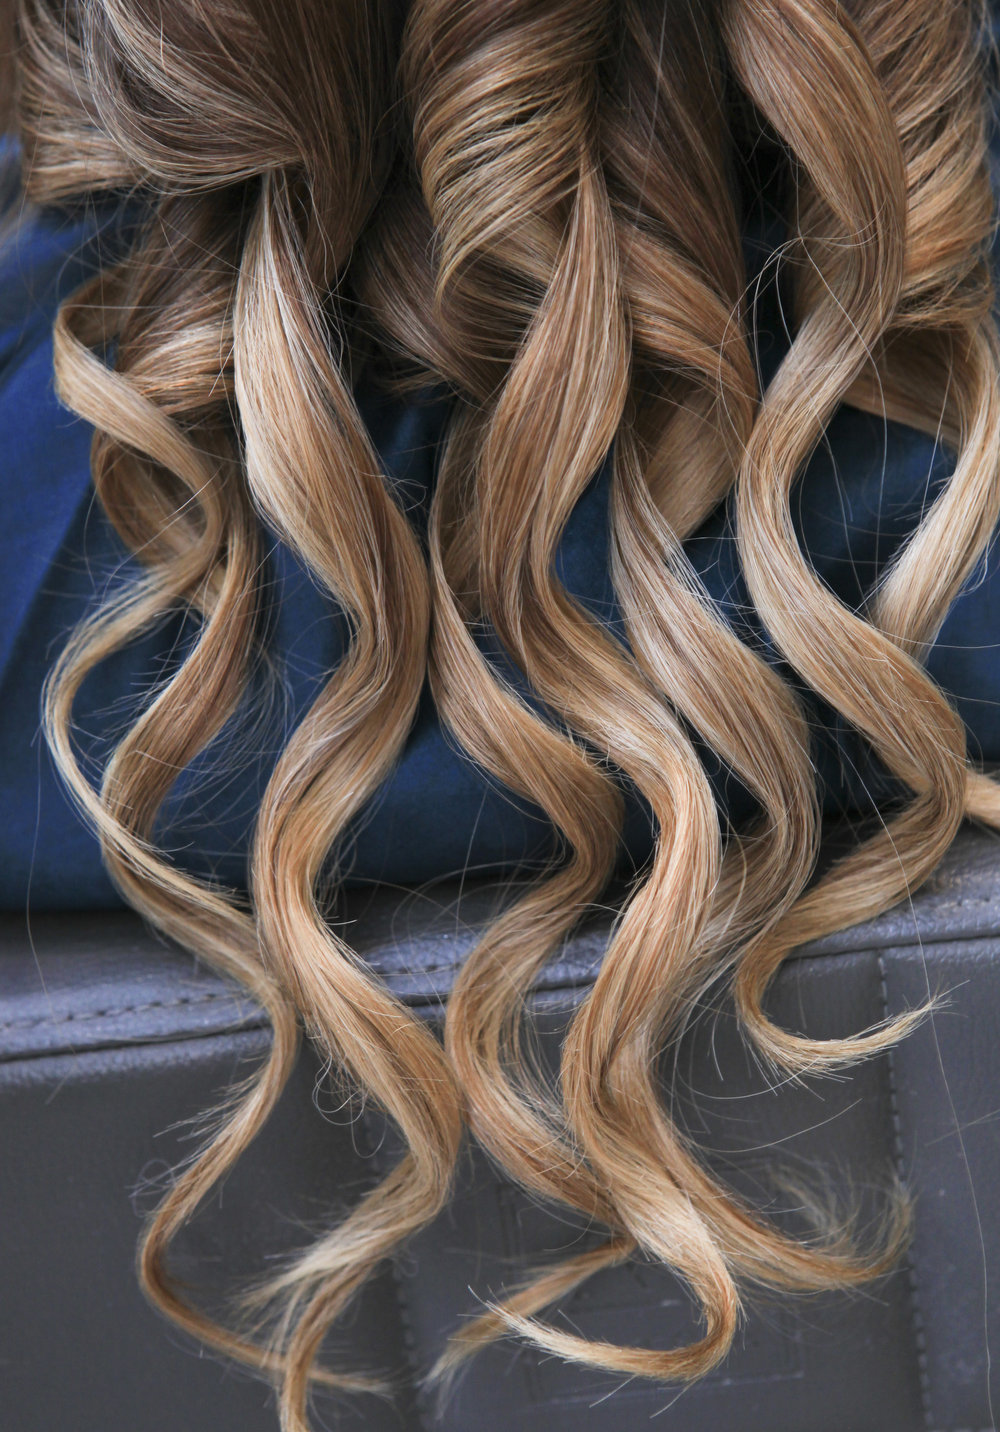 Hair Menu - 904.372.9590